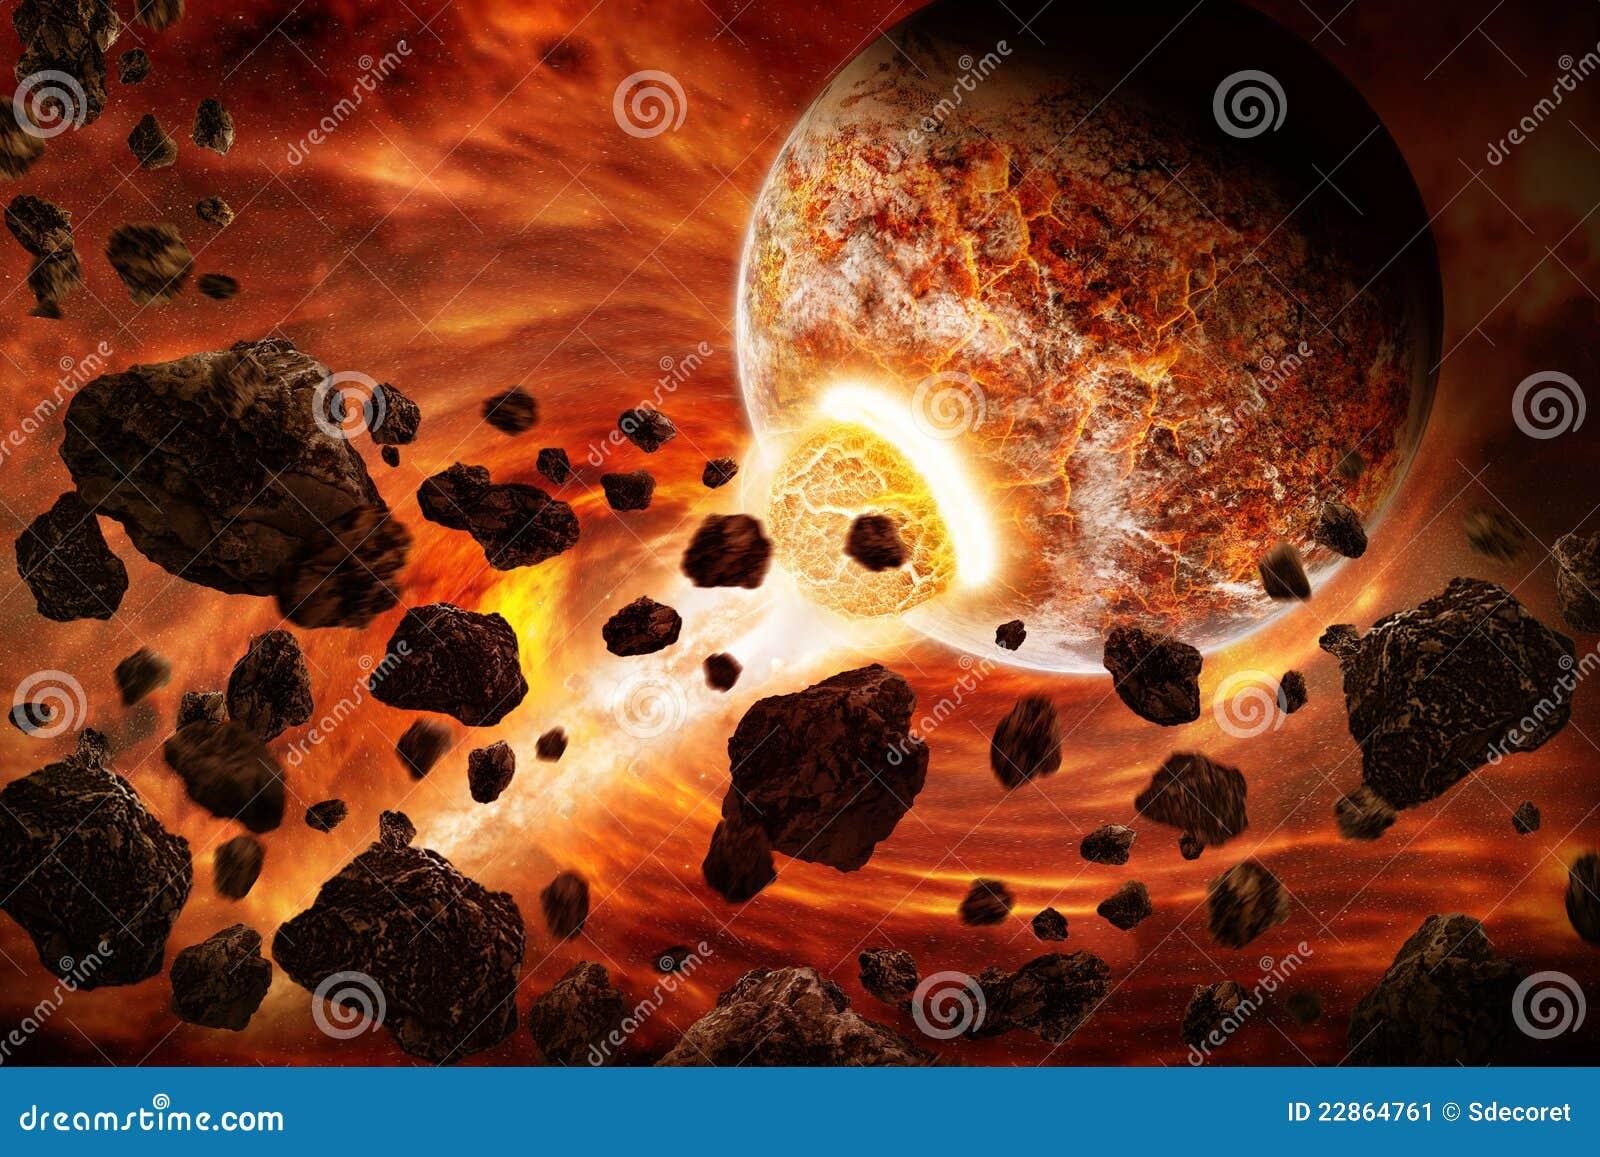 Download Planet Eart Apocalypse Illustration Stock Illustration - Illustration of ninca, fantasy: 22864761